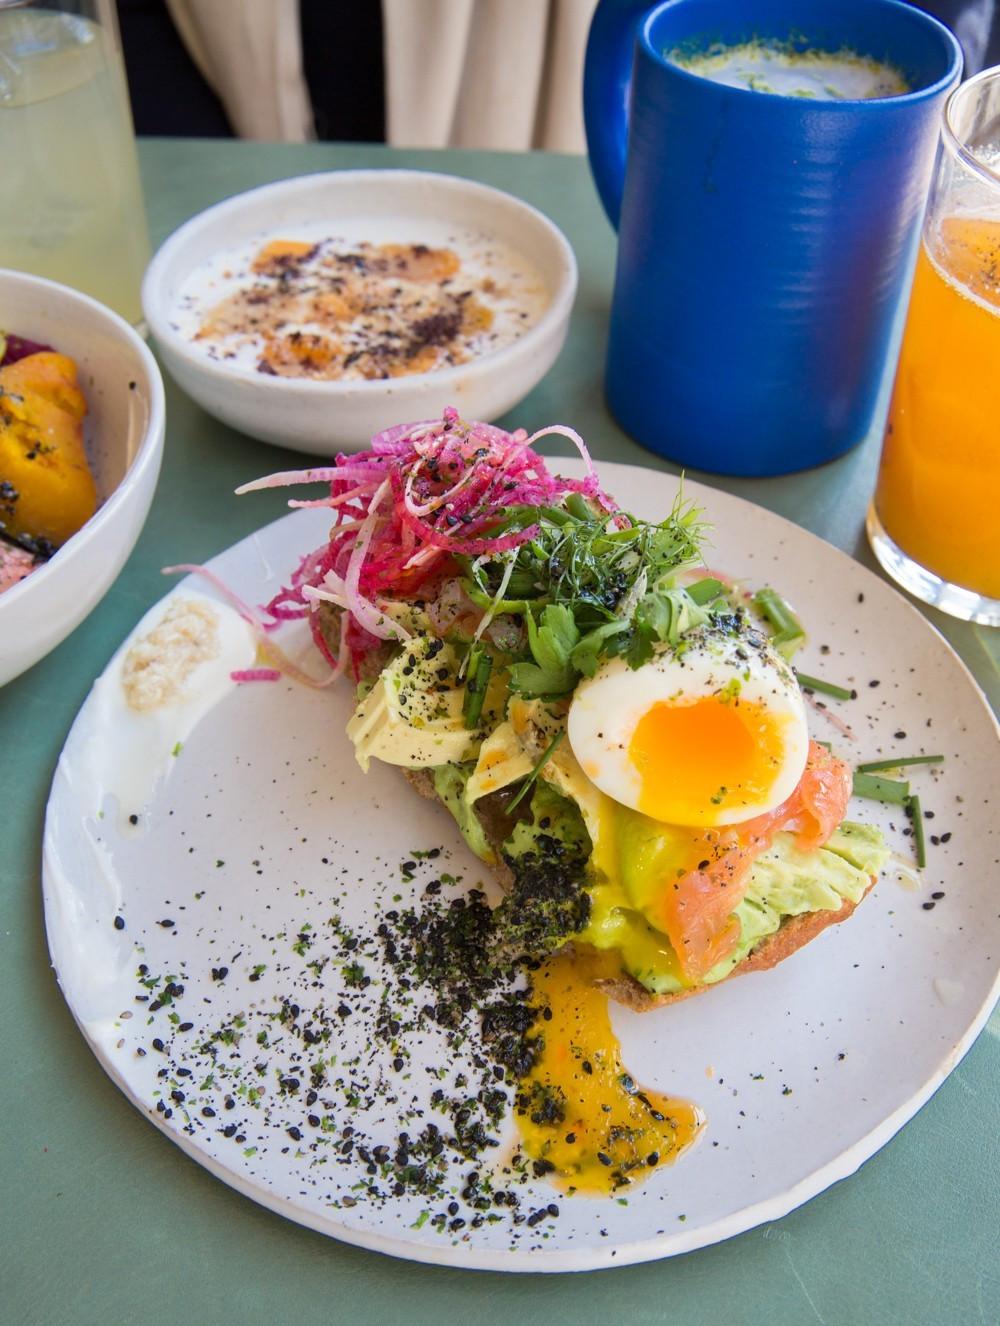 Best Healthy Breakfast Nyc  The Londoner Best Healthy Brunch in New York